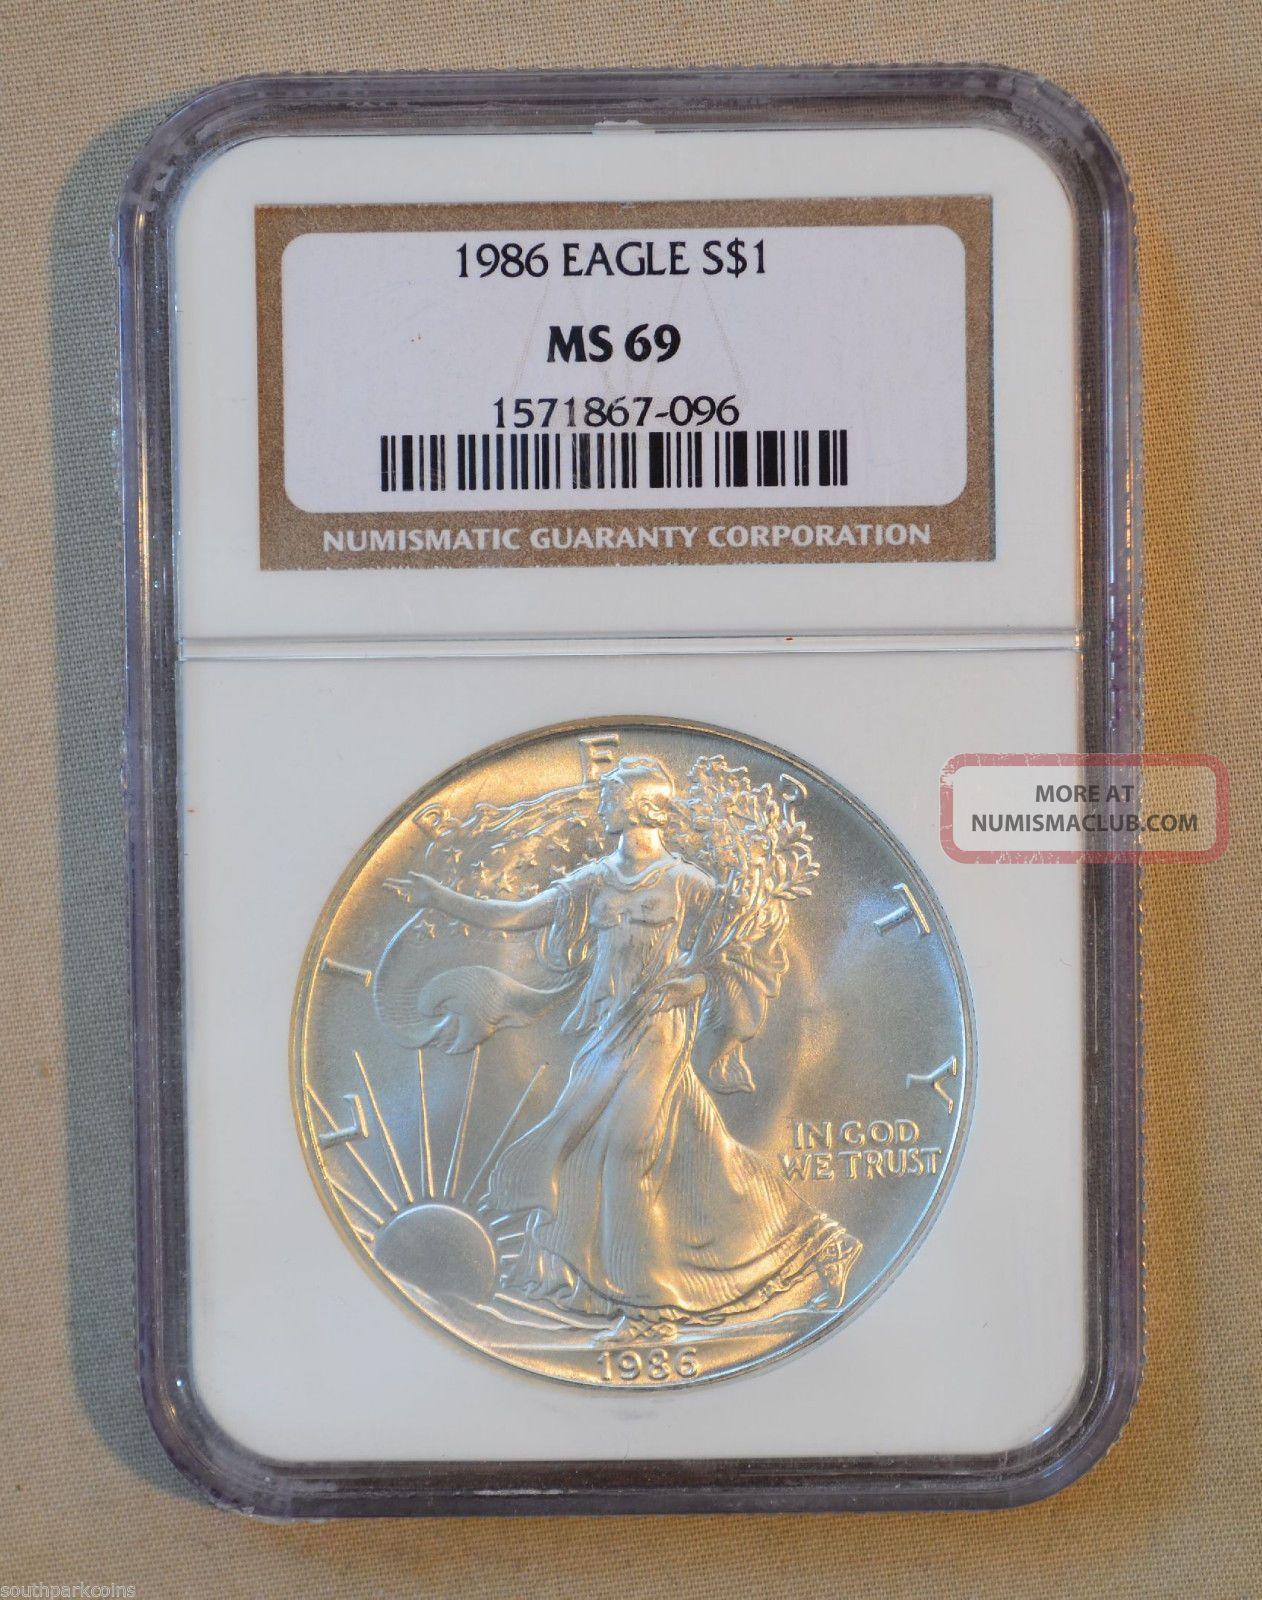 1986 Silver Eagle - Ngc Slabbed Ms69 - 1oz.  999 Fine Silver Silver photo